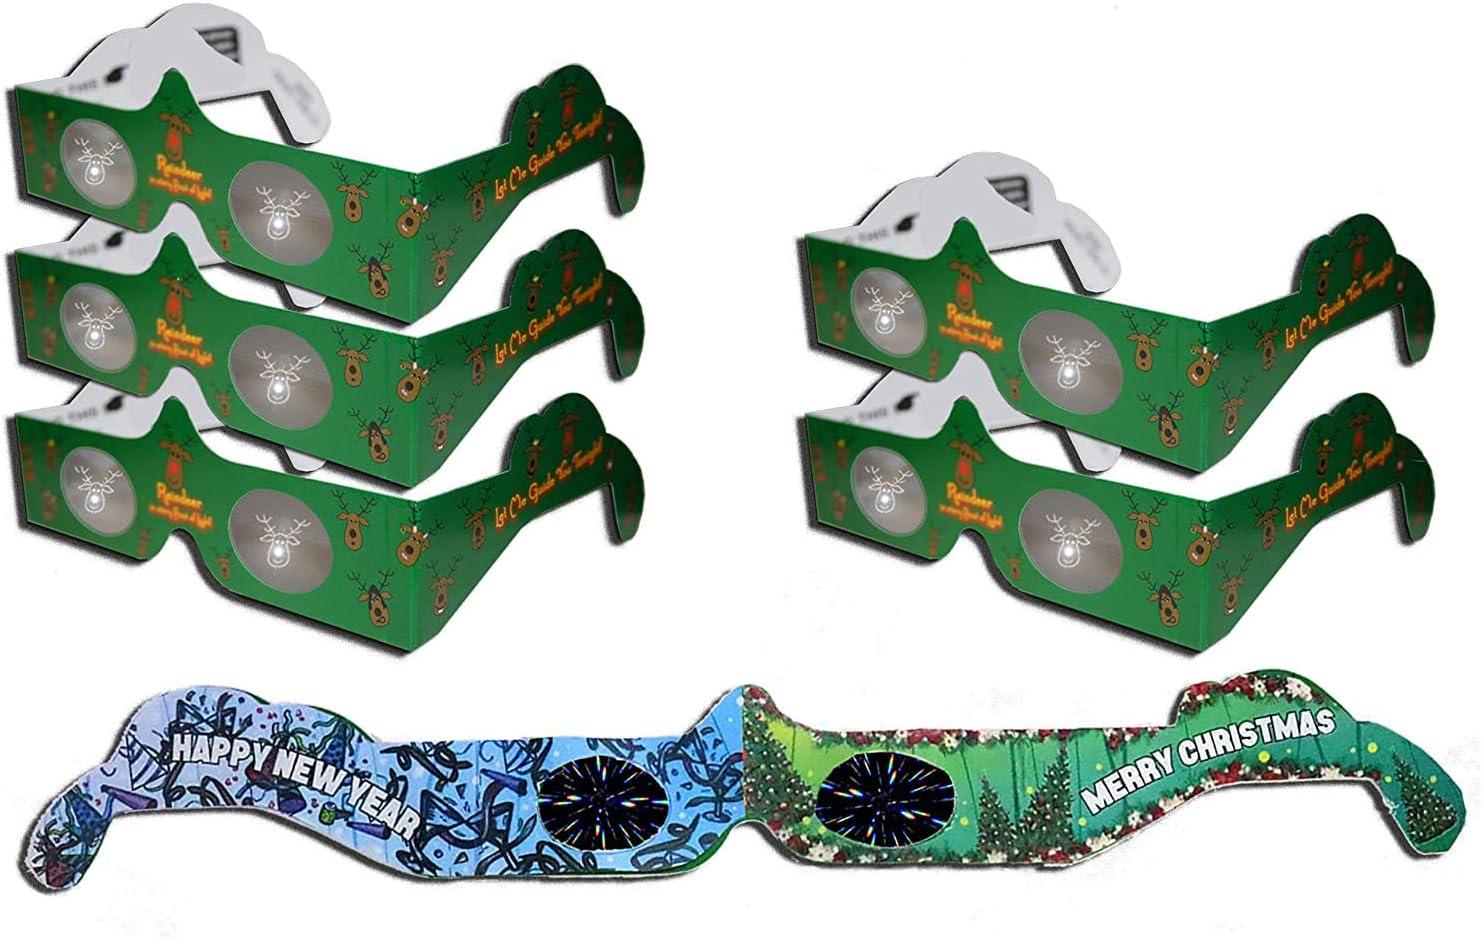 HolidayEyes R Bargain sale Christmas Award 3D 6 Reindeer Glasses